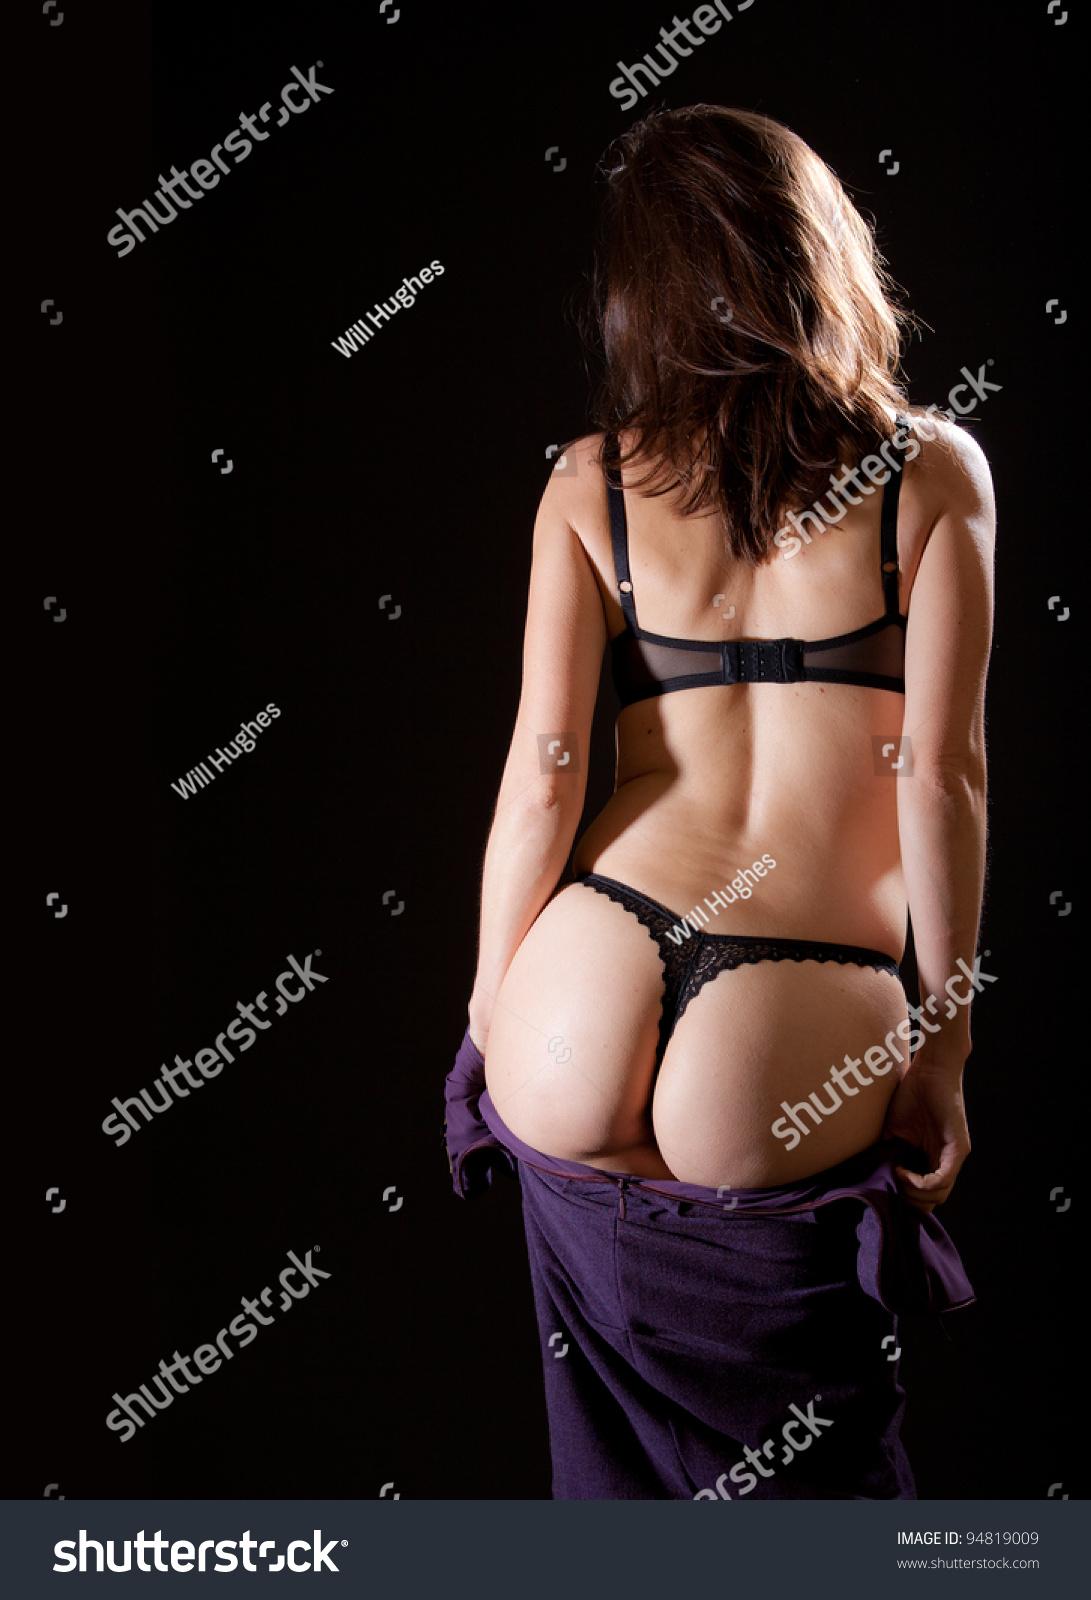 Hot Stripping